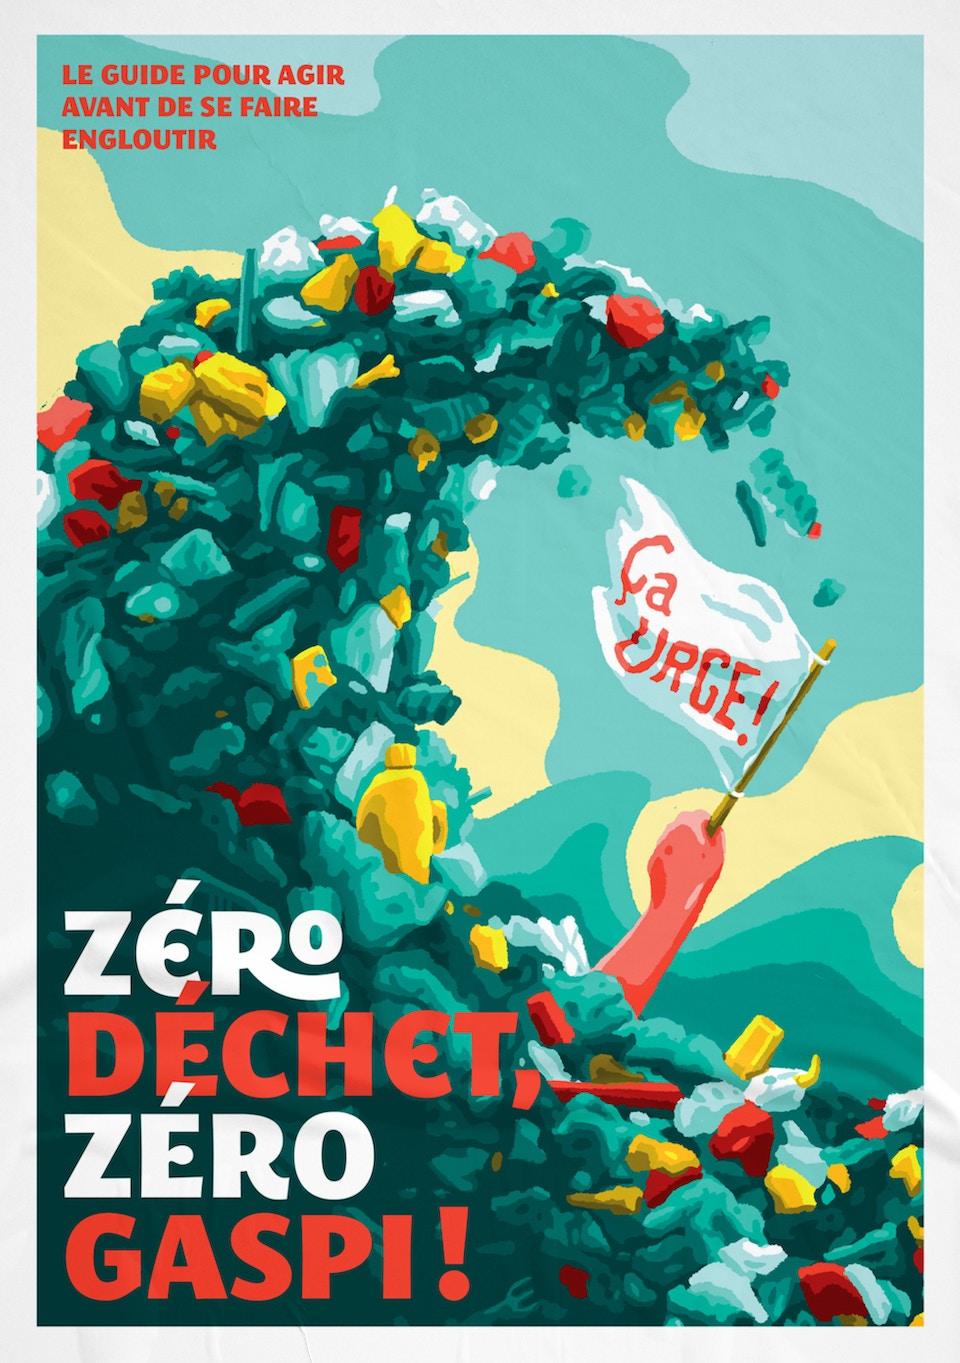 — Zero Waste Paris